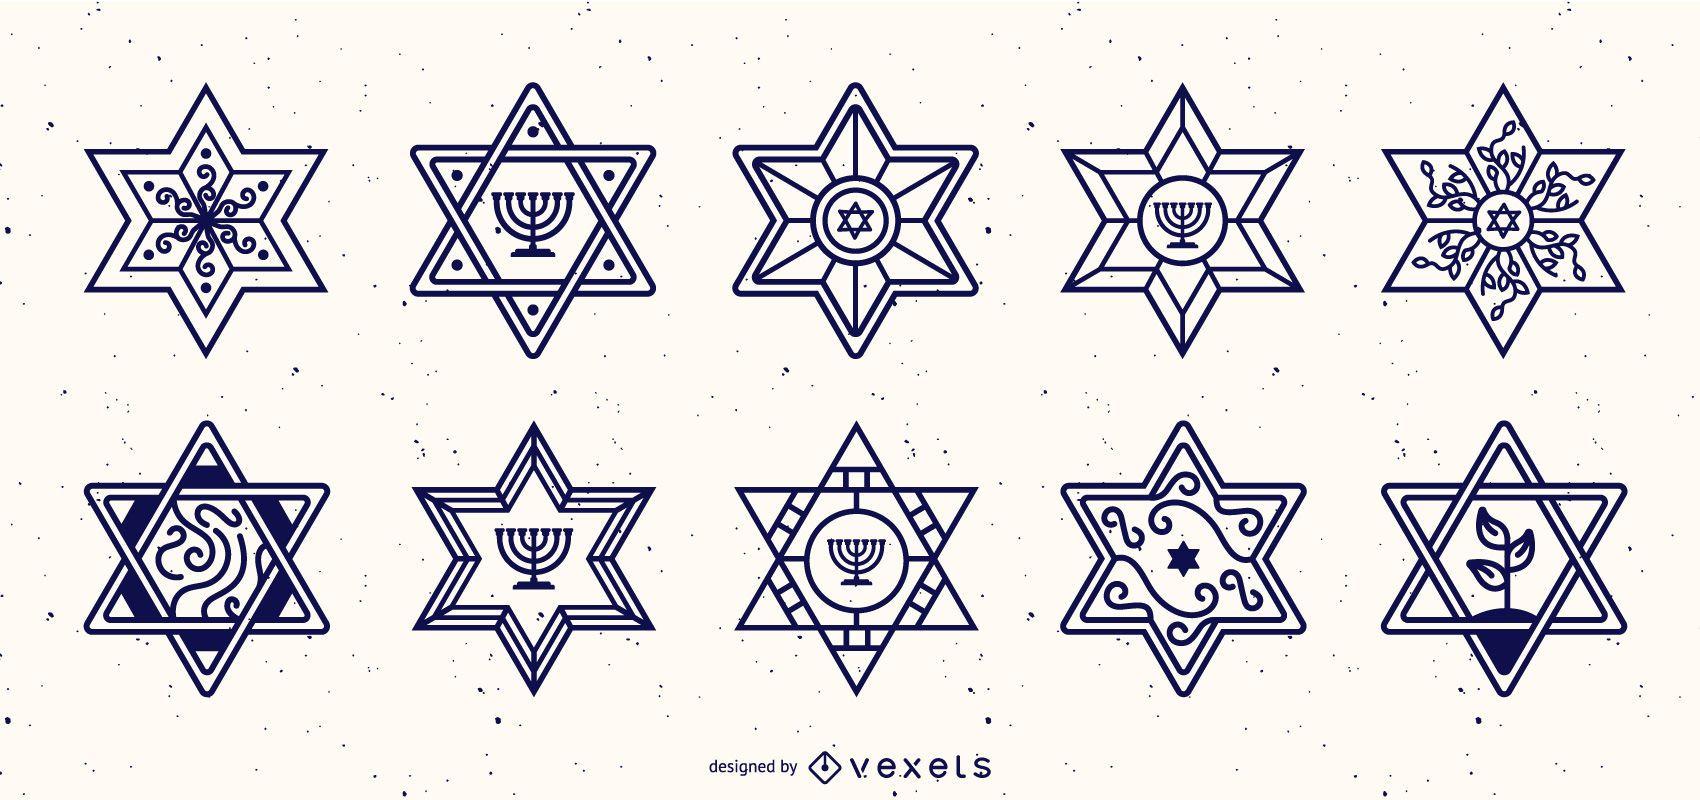 Star of David Stroke Design Collection